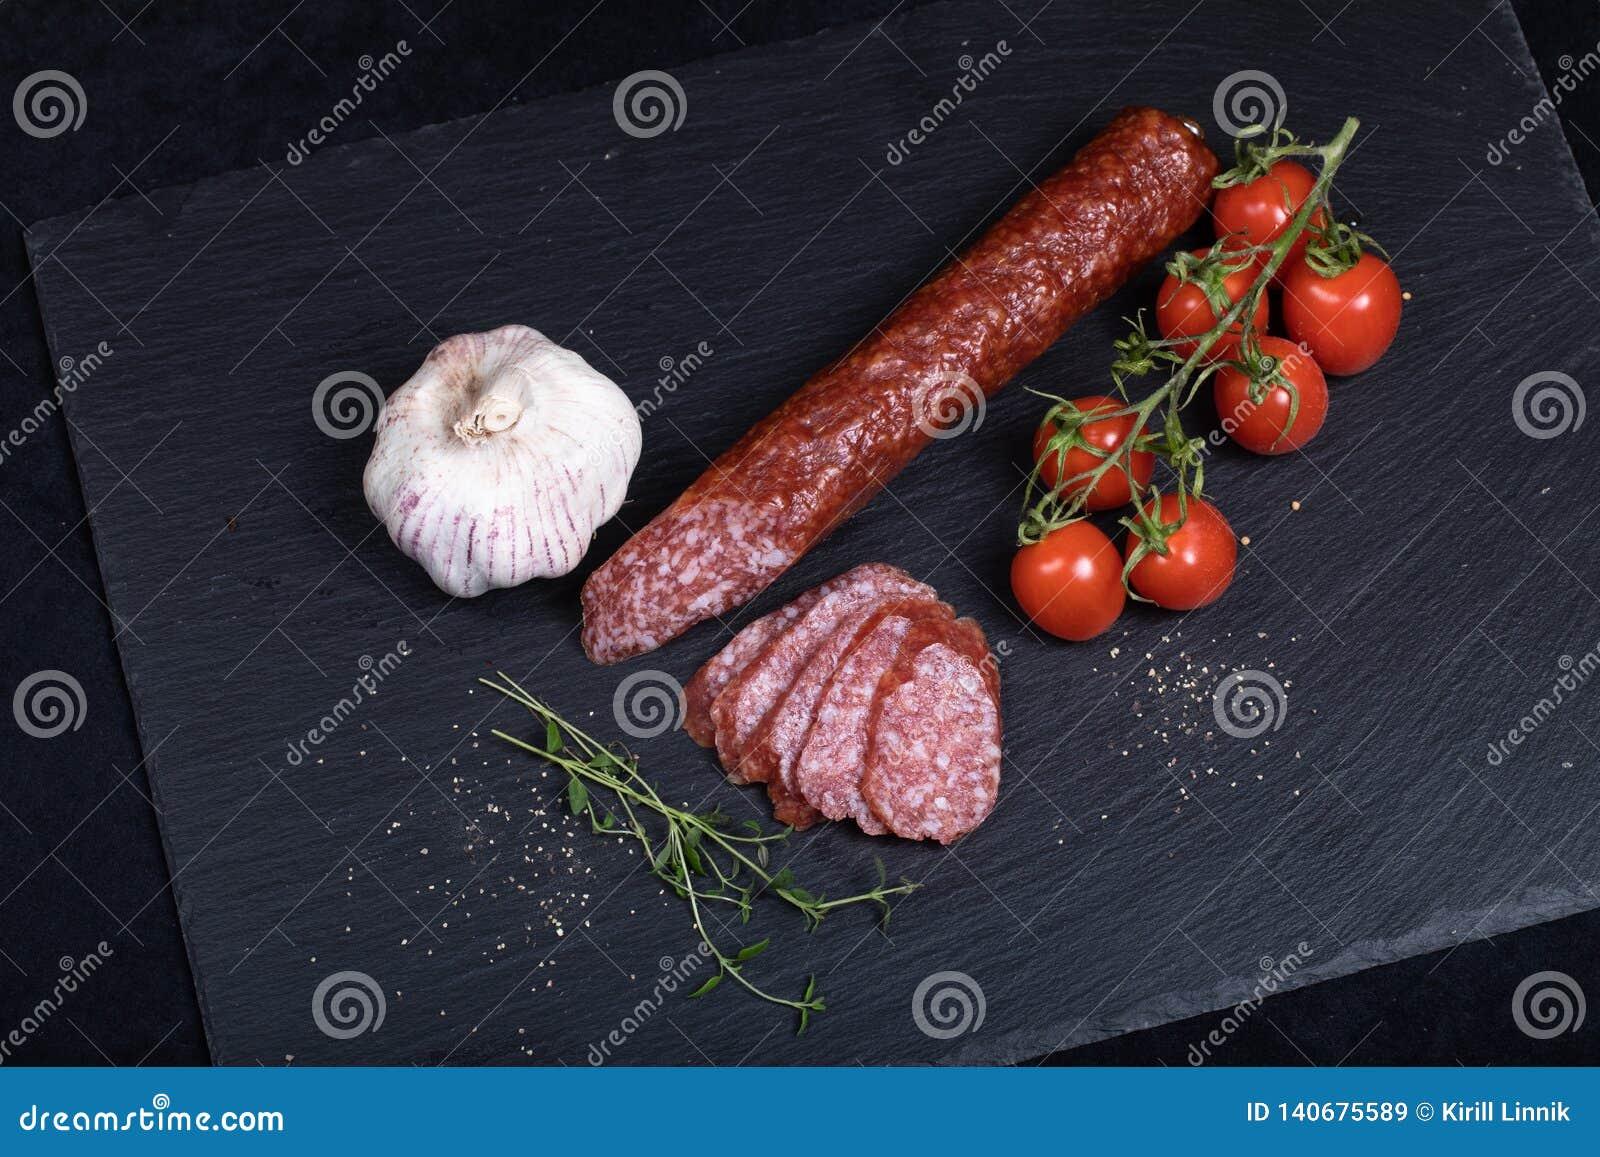 Salami on black stone plate